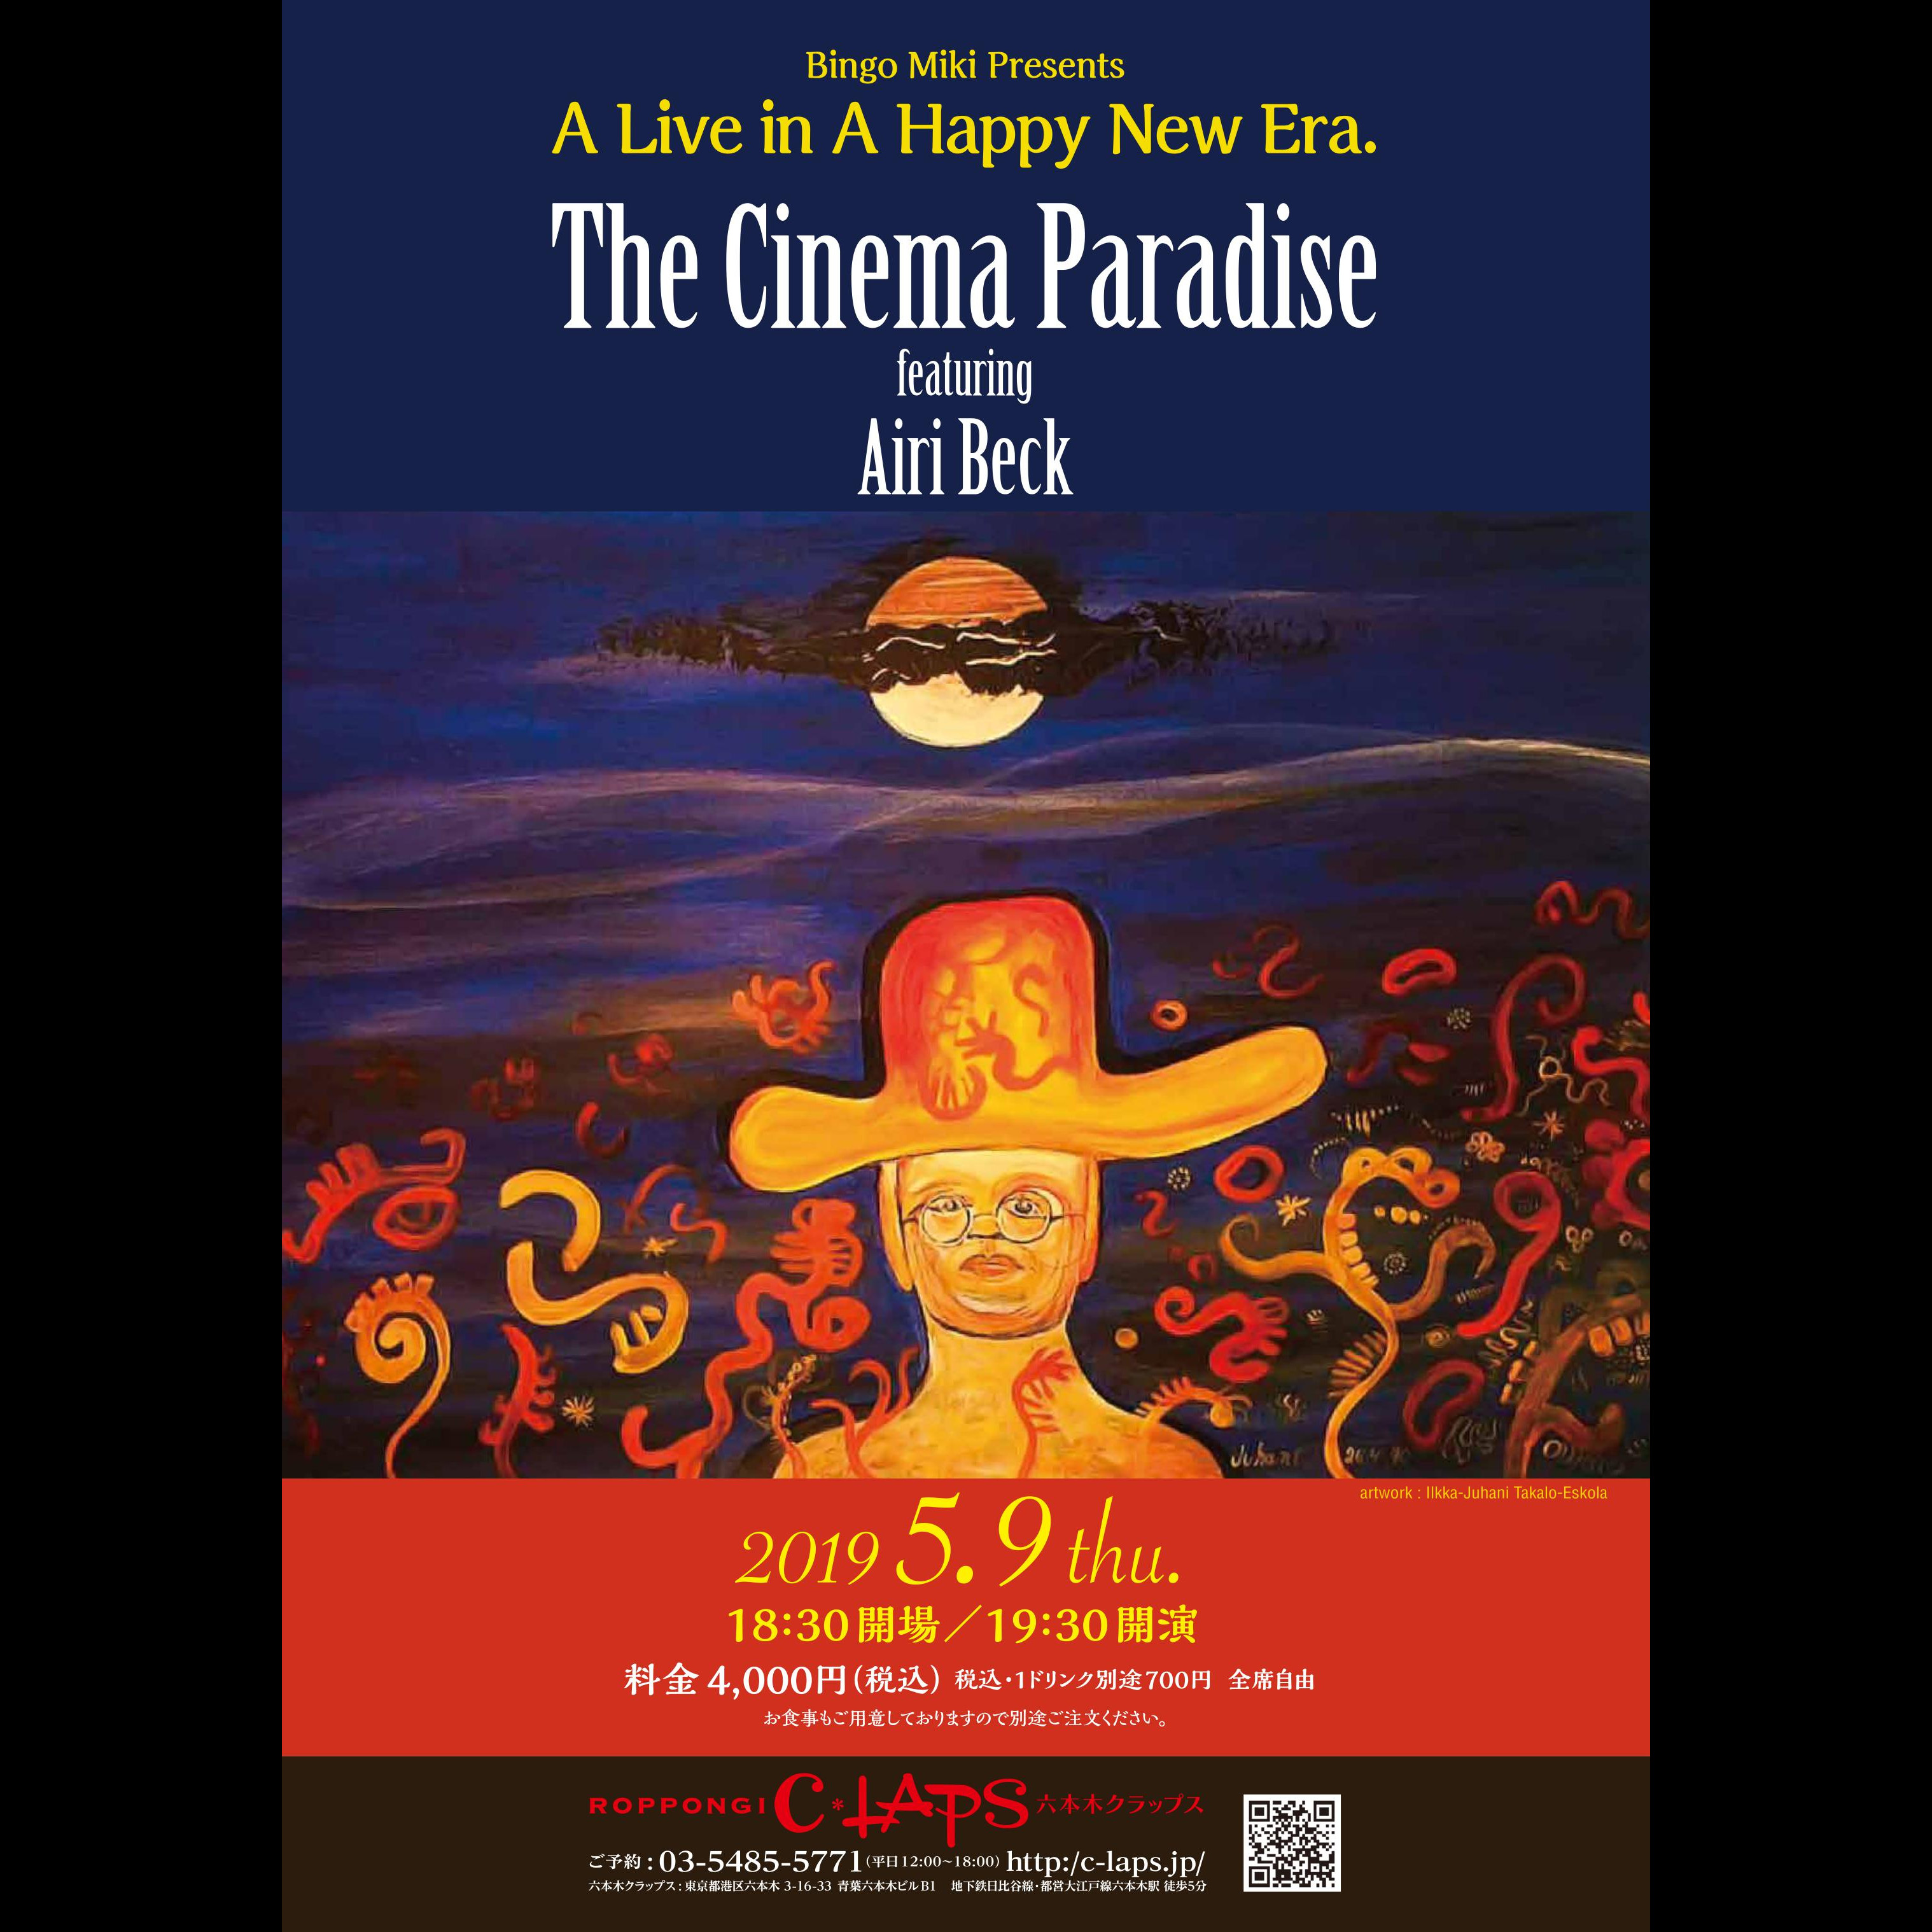 Bingo Miki Presents The Cinema Paradise